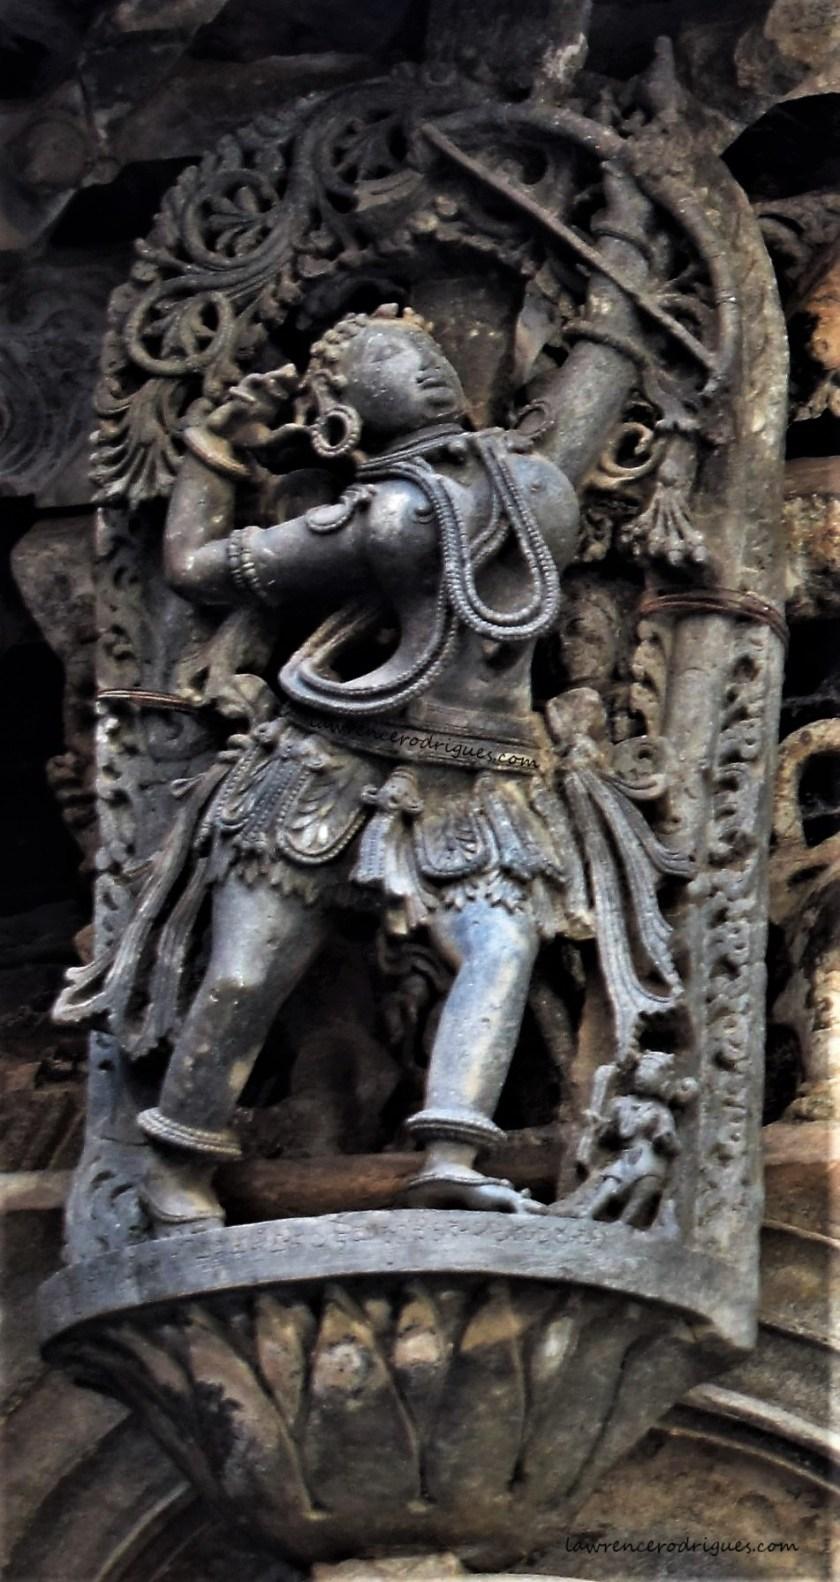 Madanike hunting a bird - A bracket figure mounterd on the exterior wall of the Belur Chennakeshava Temple in Karnataka, India